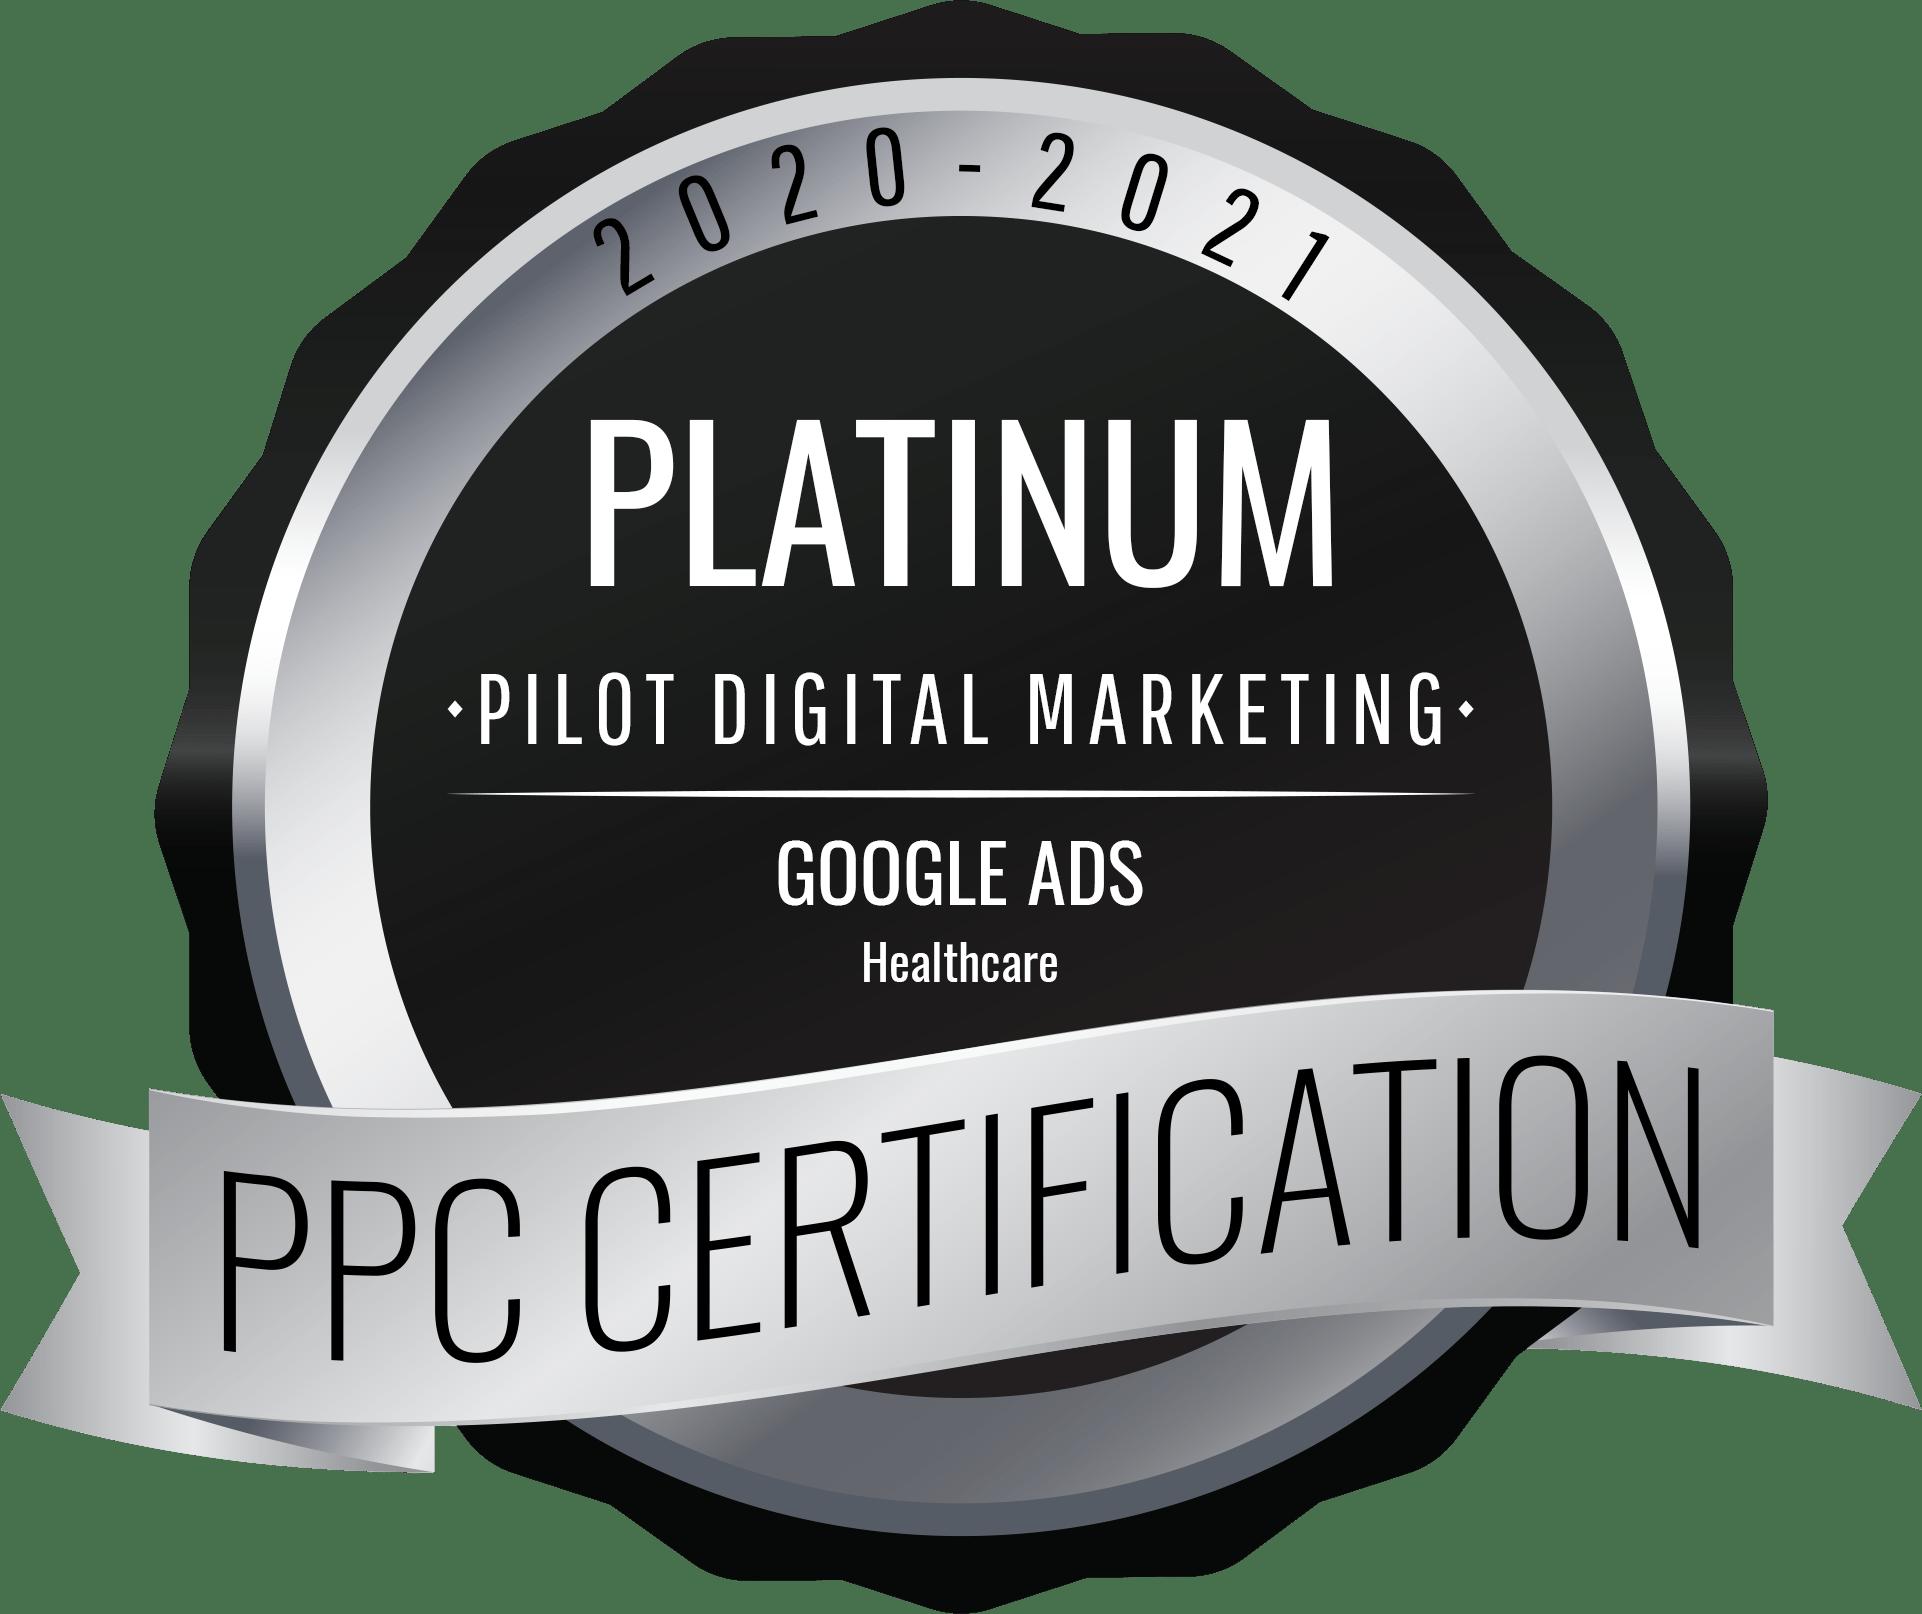 PPC Certification